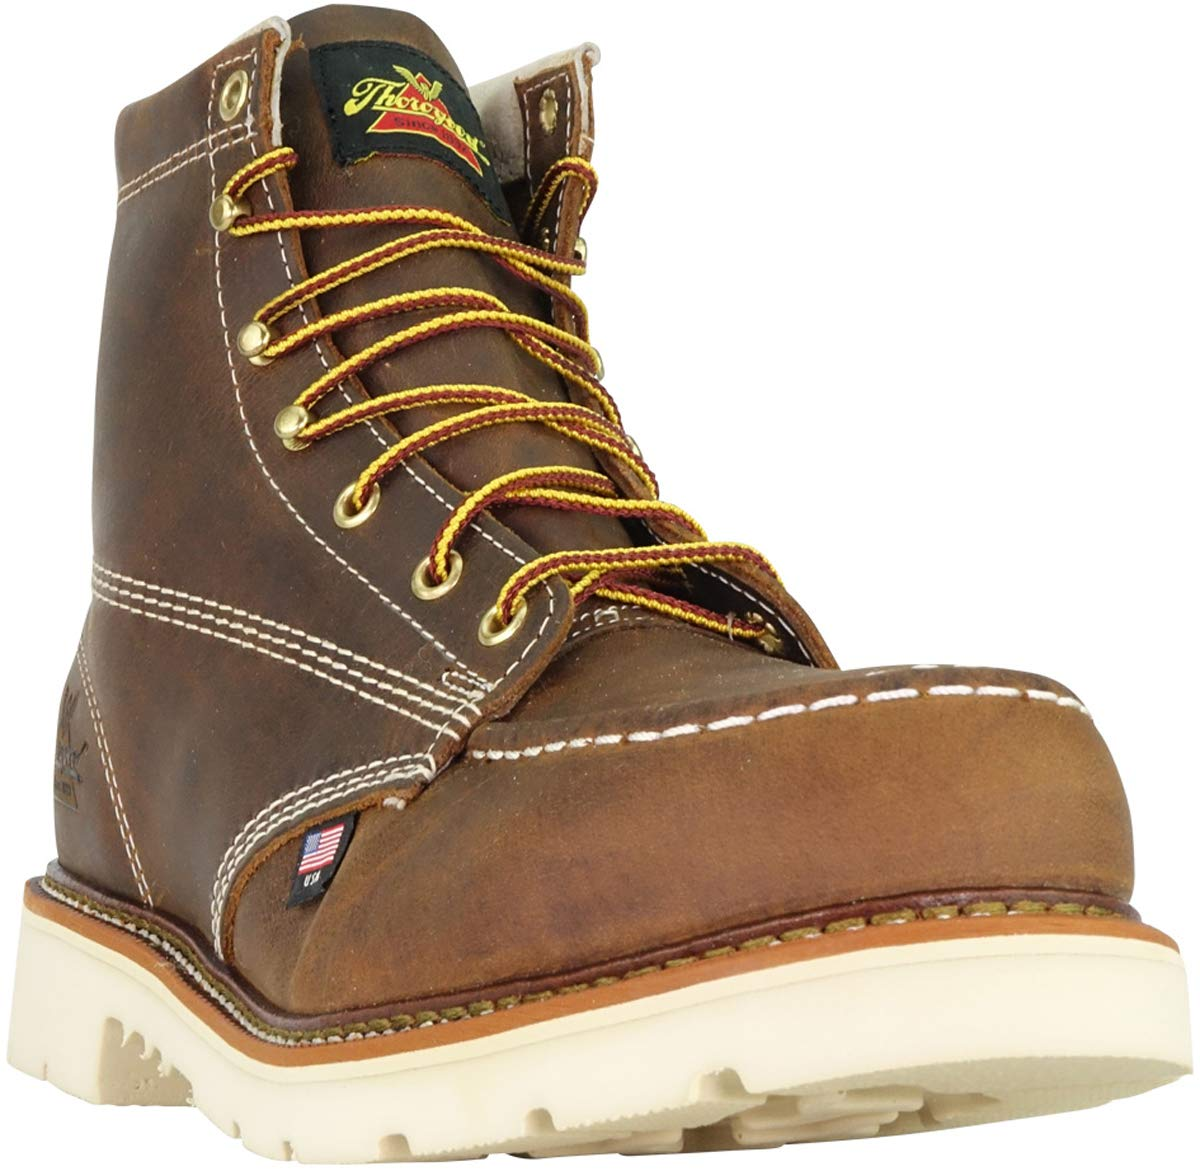 Thorogood-American-Heritage-Men-039-s-6-034-Moc-Toe-MaxWear90-Steel-Toed-Safety-Boot thumbnail 3